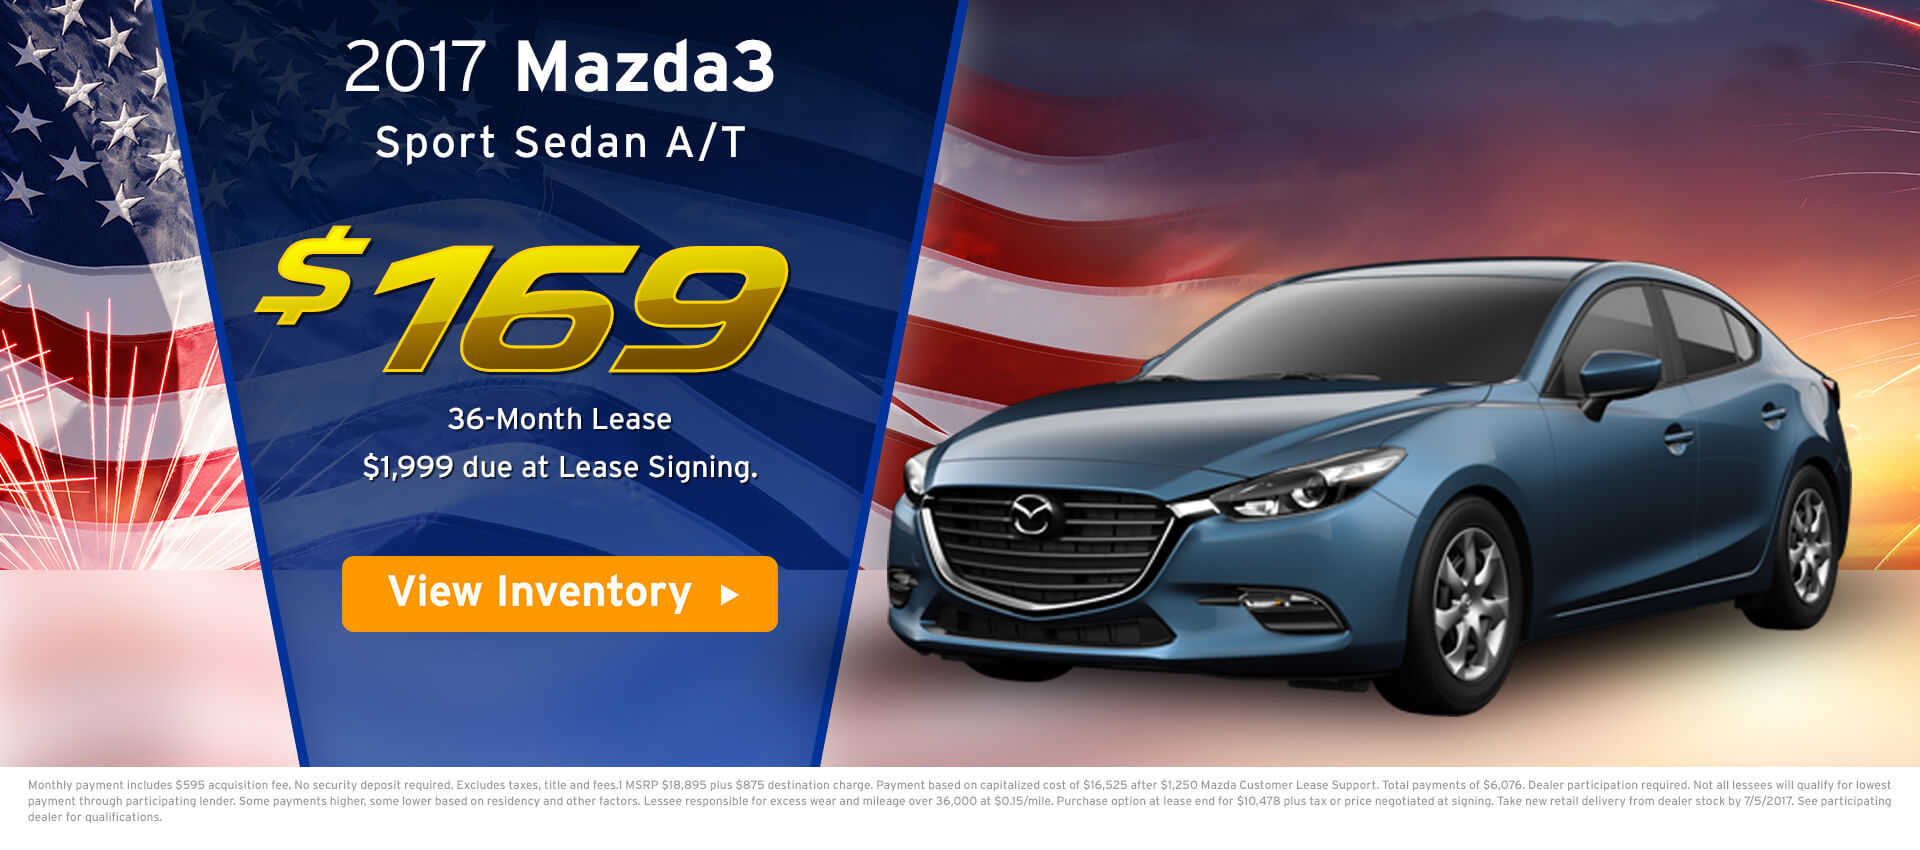 Mazda 3 Lease